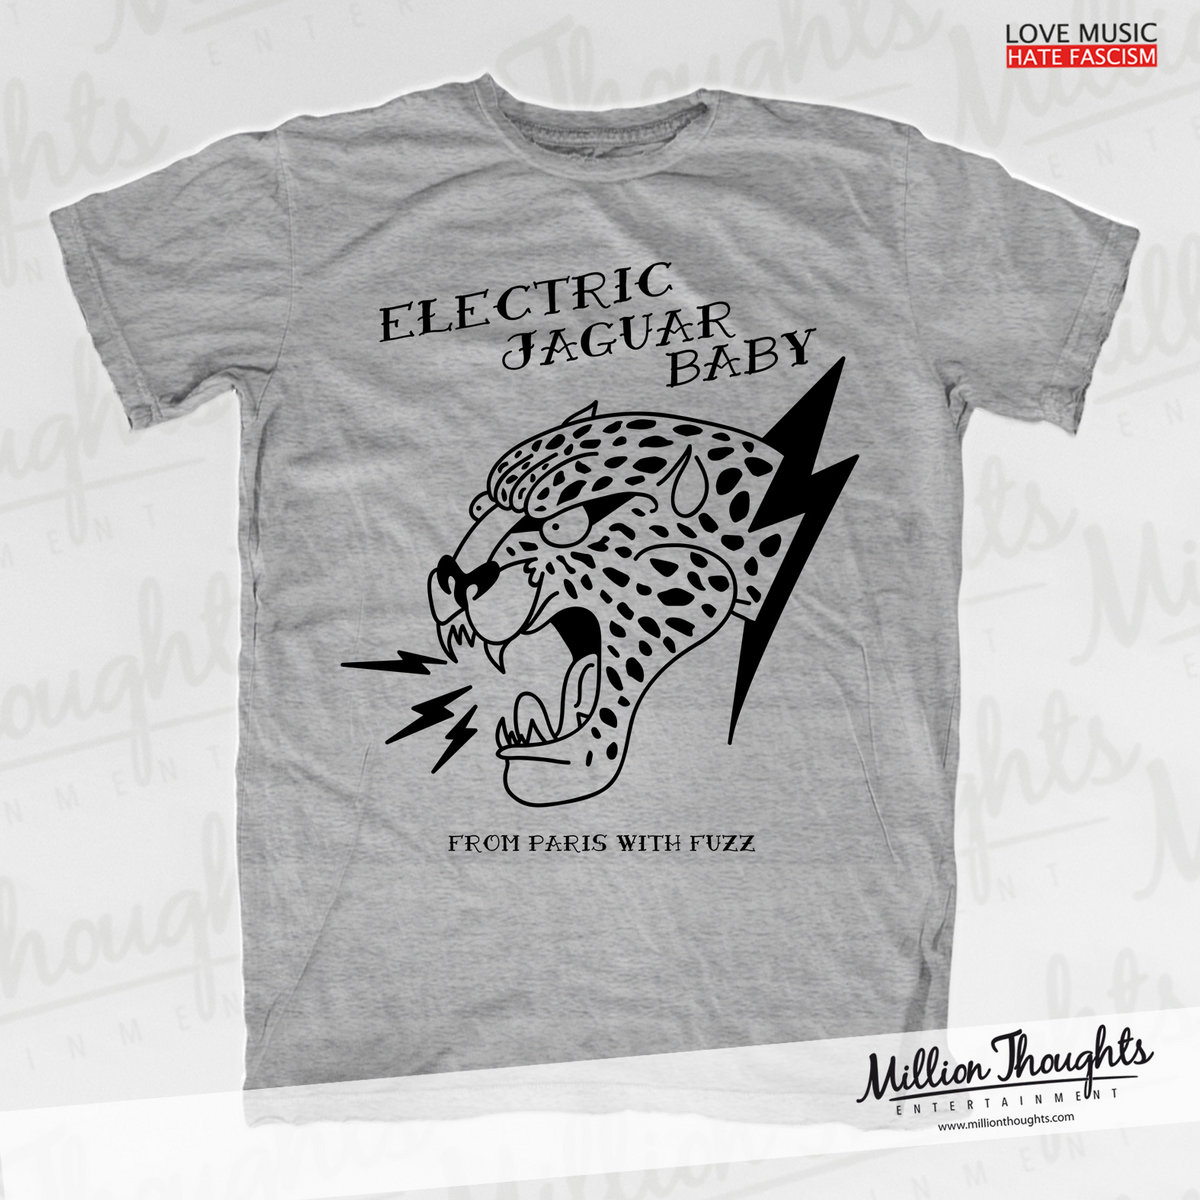 Foxy Lady Jimi Hendrix Cover Electric Jaguar Baby